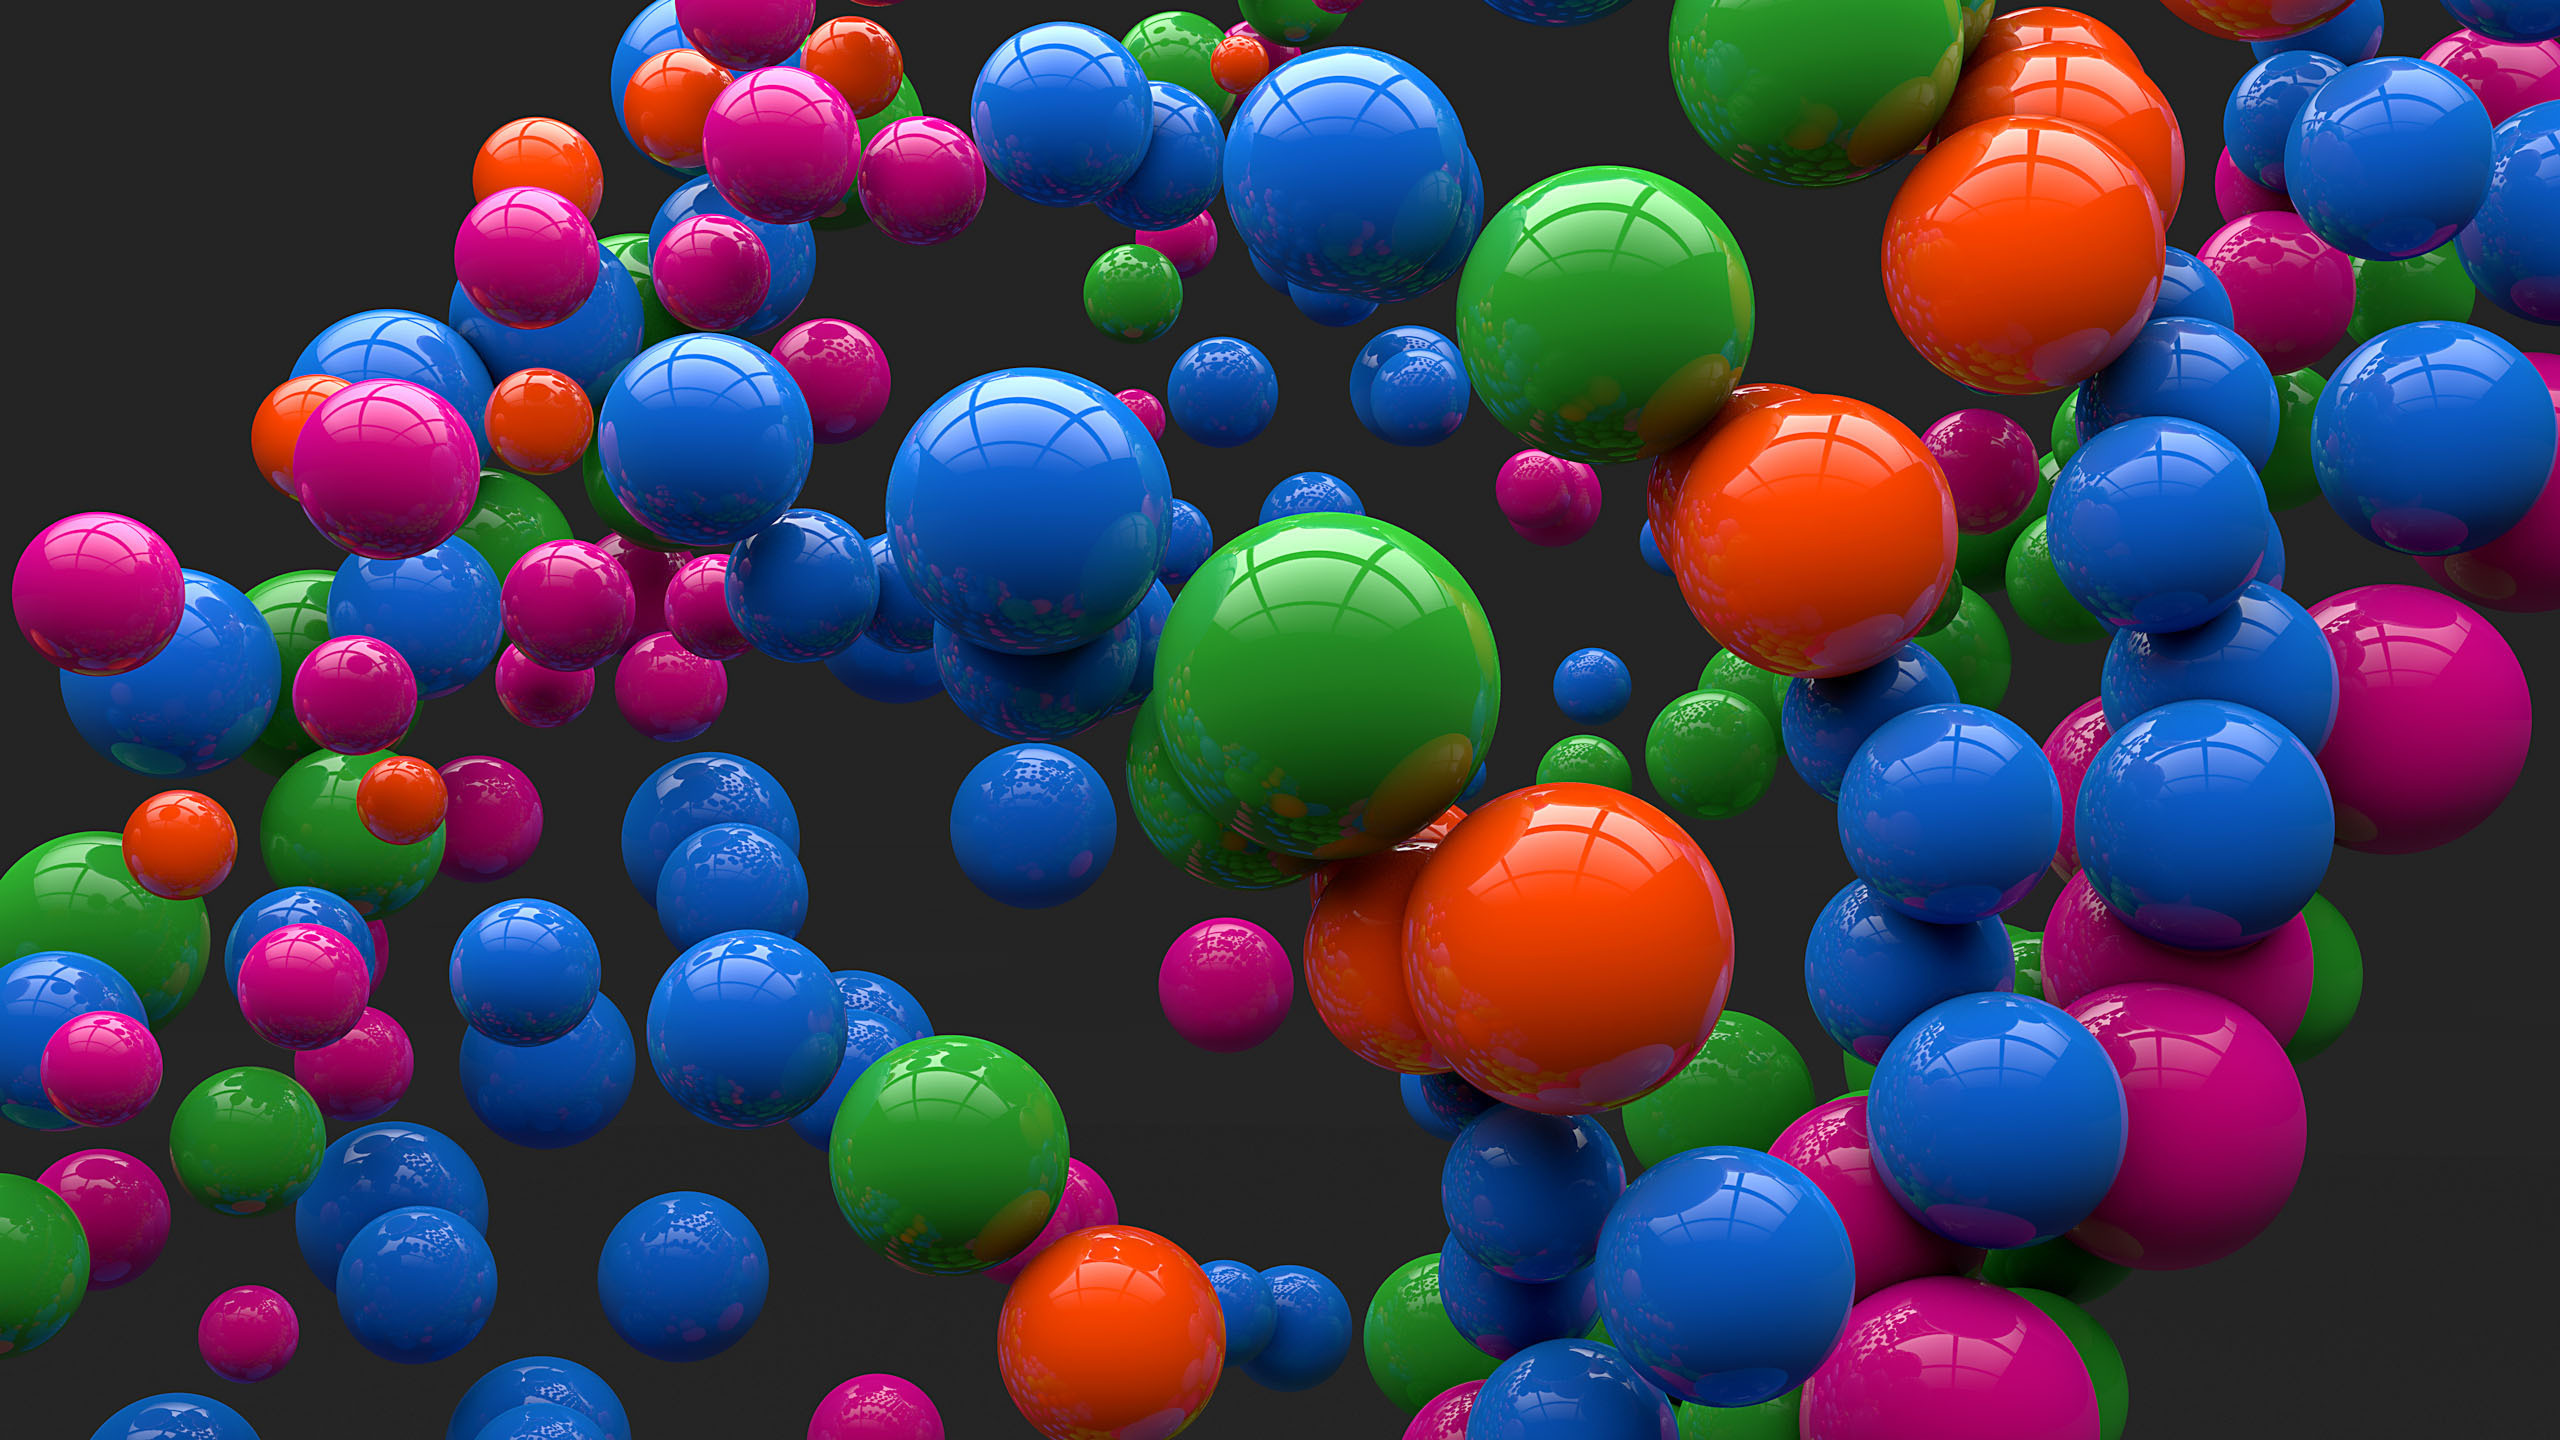 59 Bubble HD Wallpapers